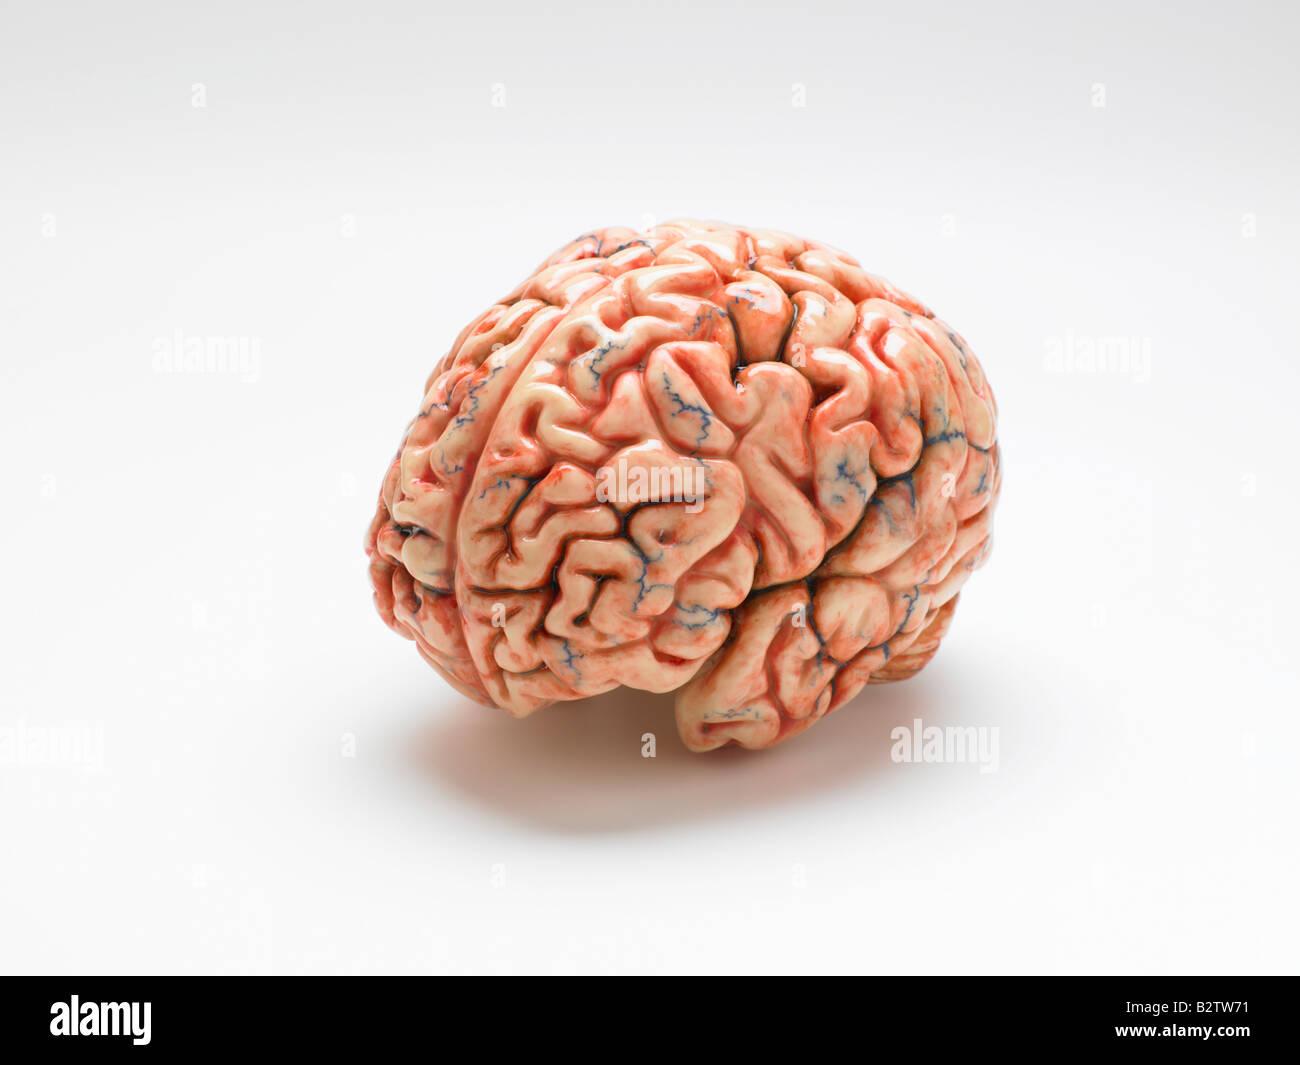 model of a human brain - Stock Image